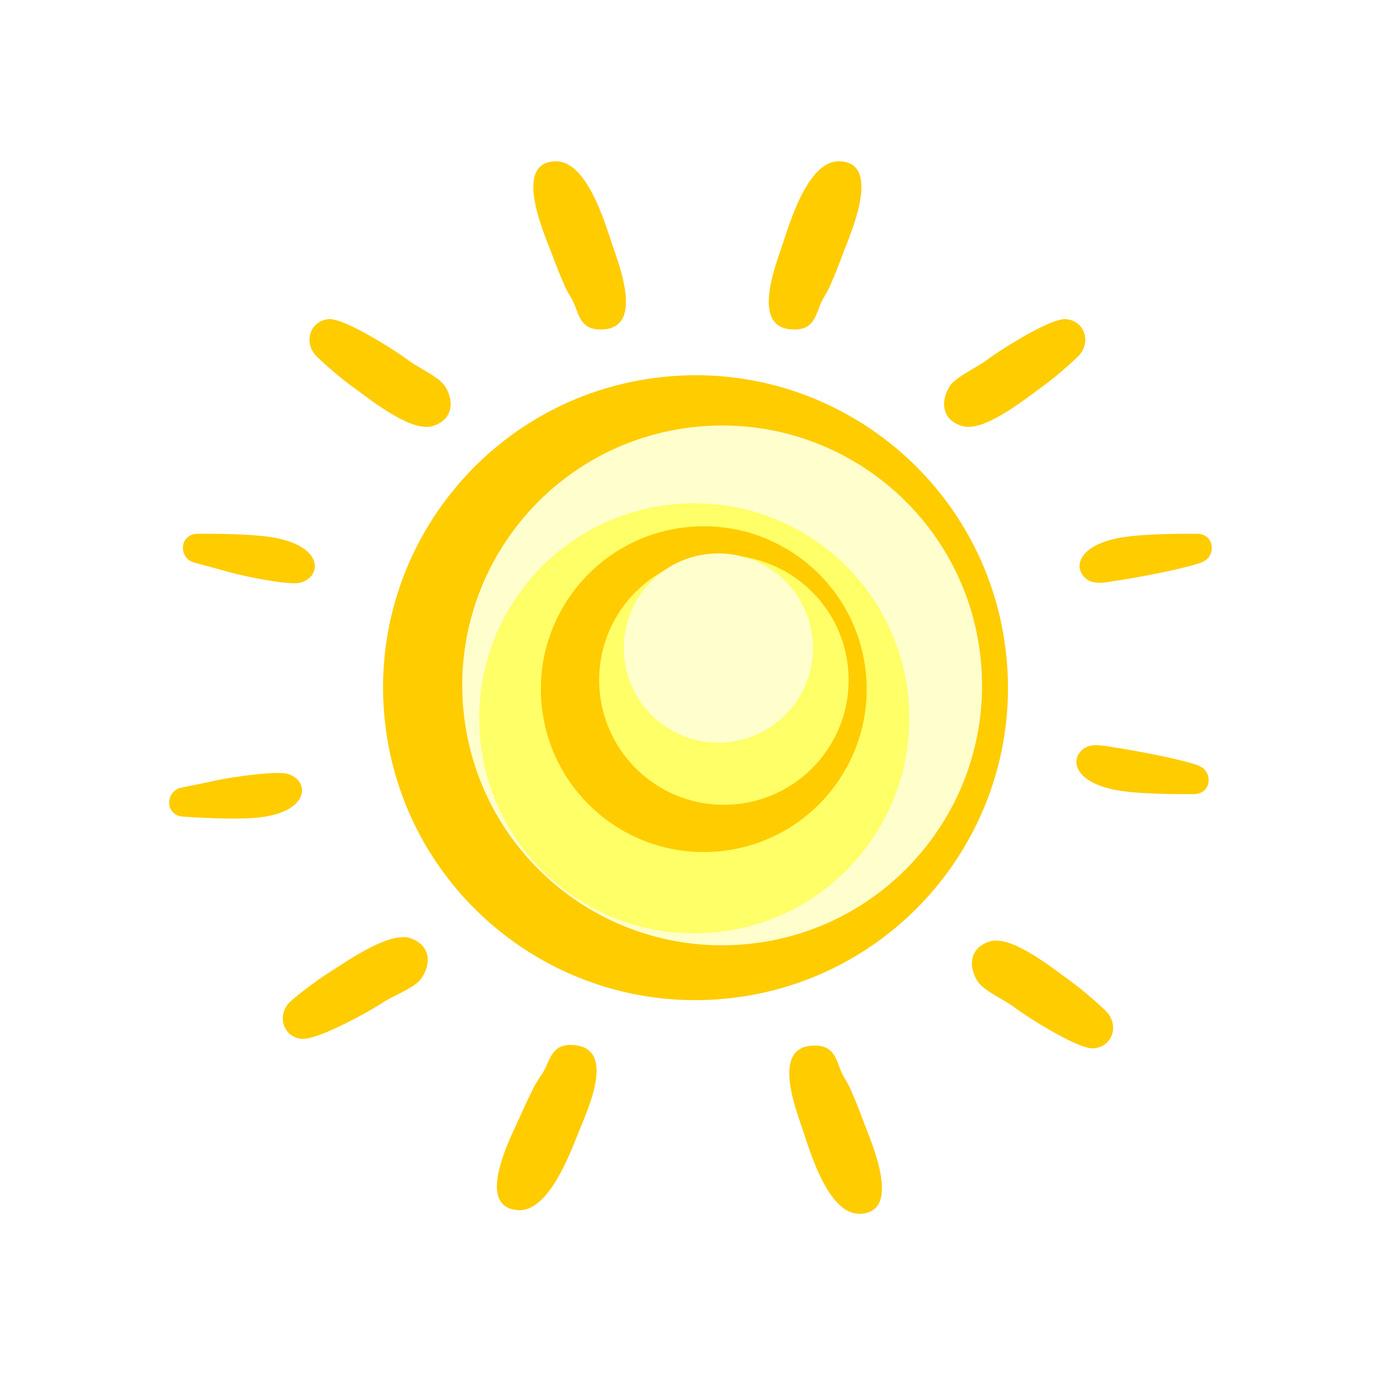 Kimberly Painting - Exterior Painting Update - Yellow Sun Image